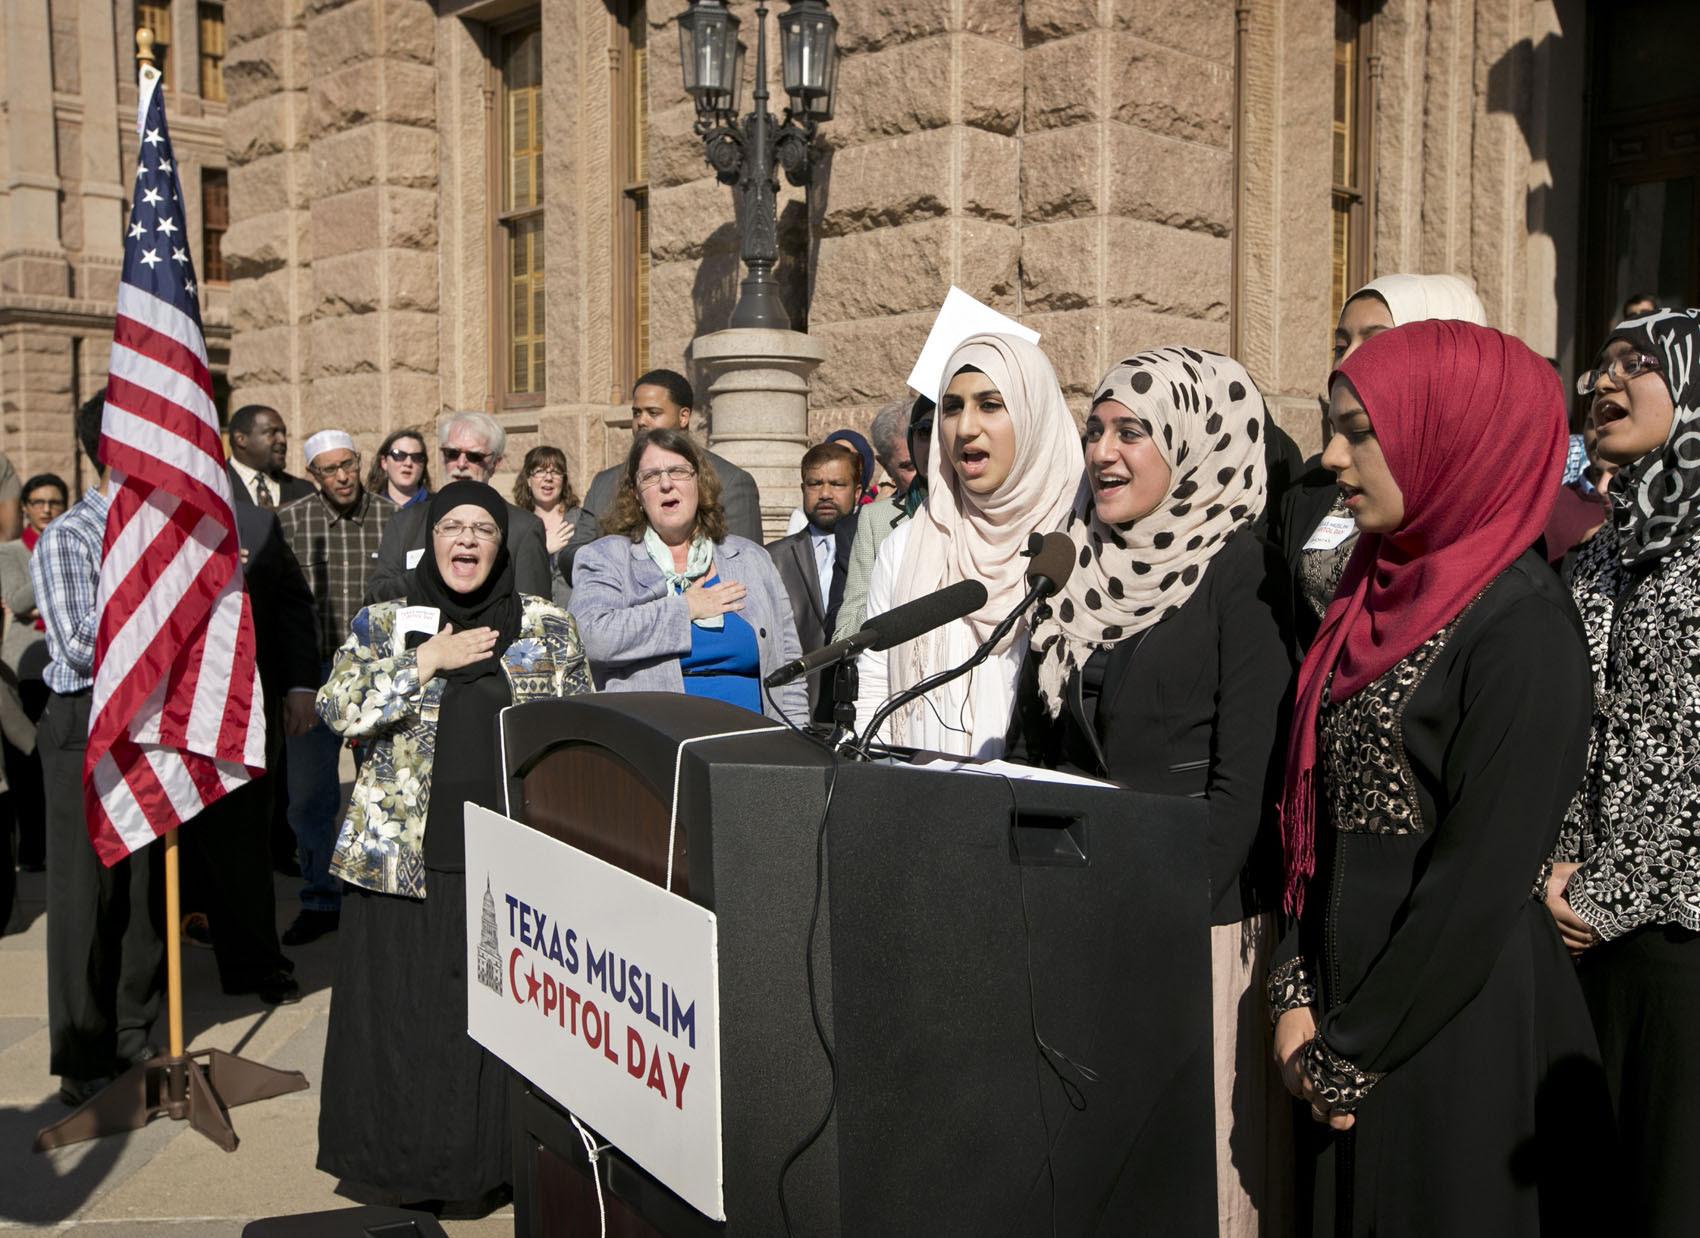 http://photoblog.statesman.com/wp-content/uploads/muslim-0006.jpg